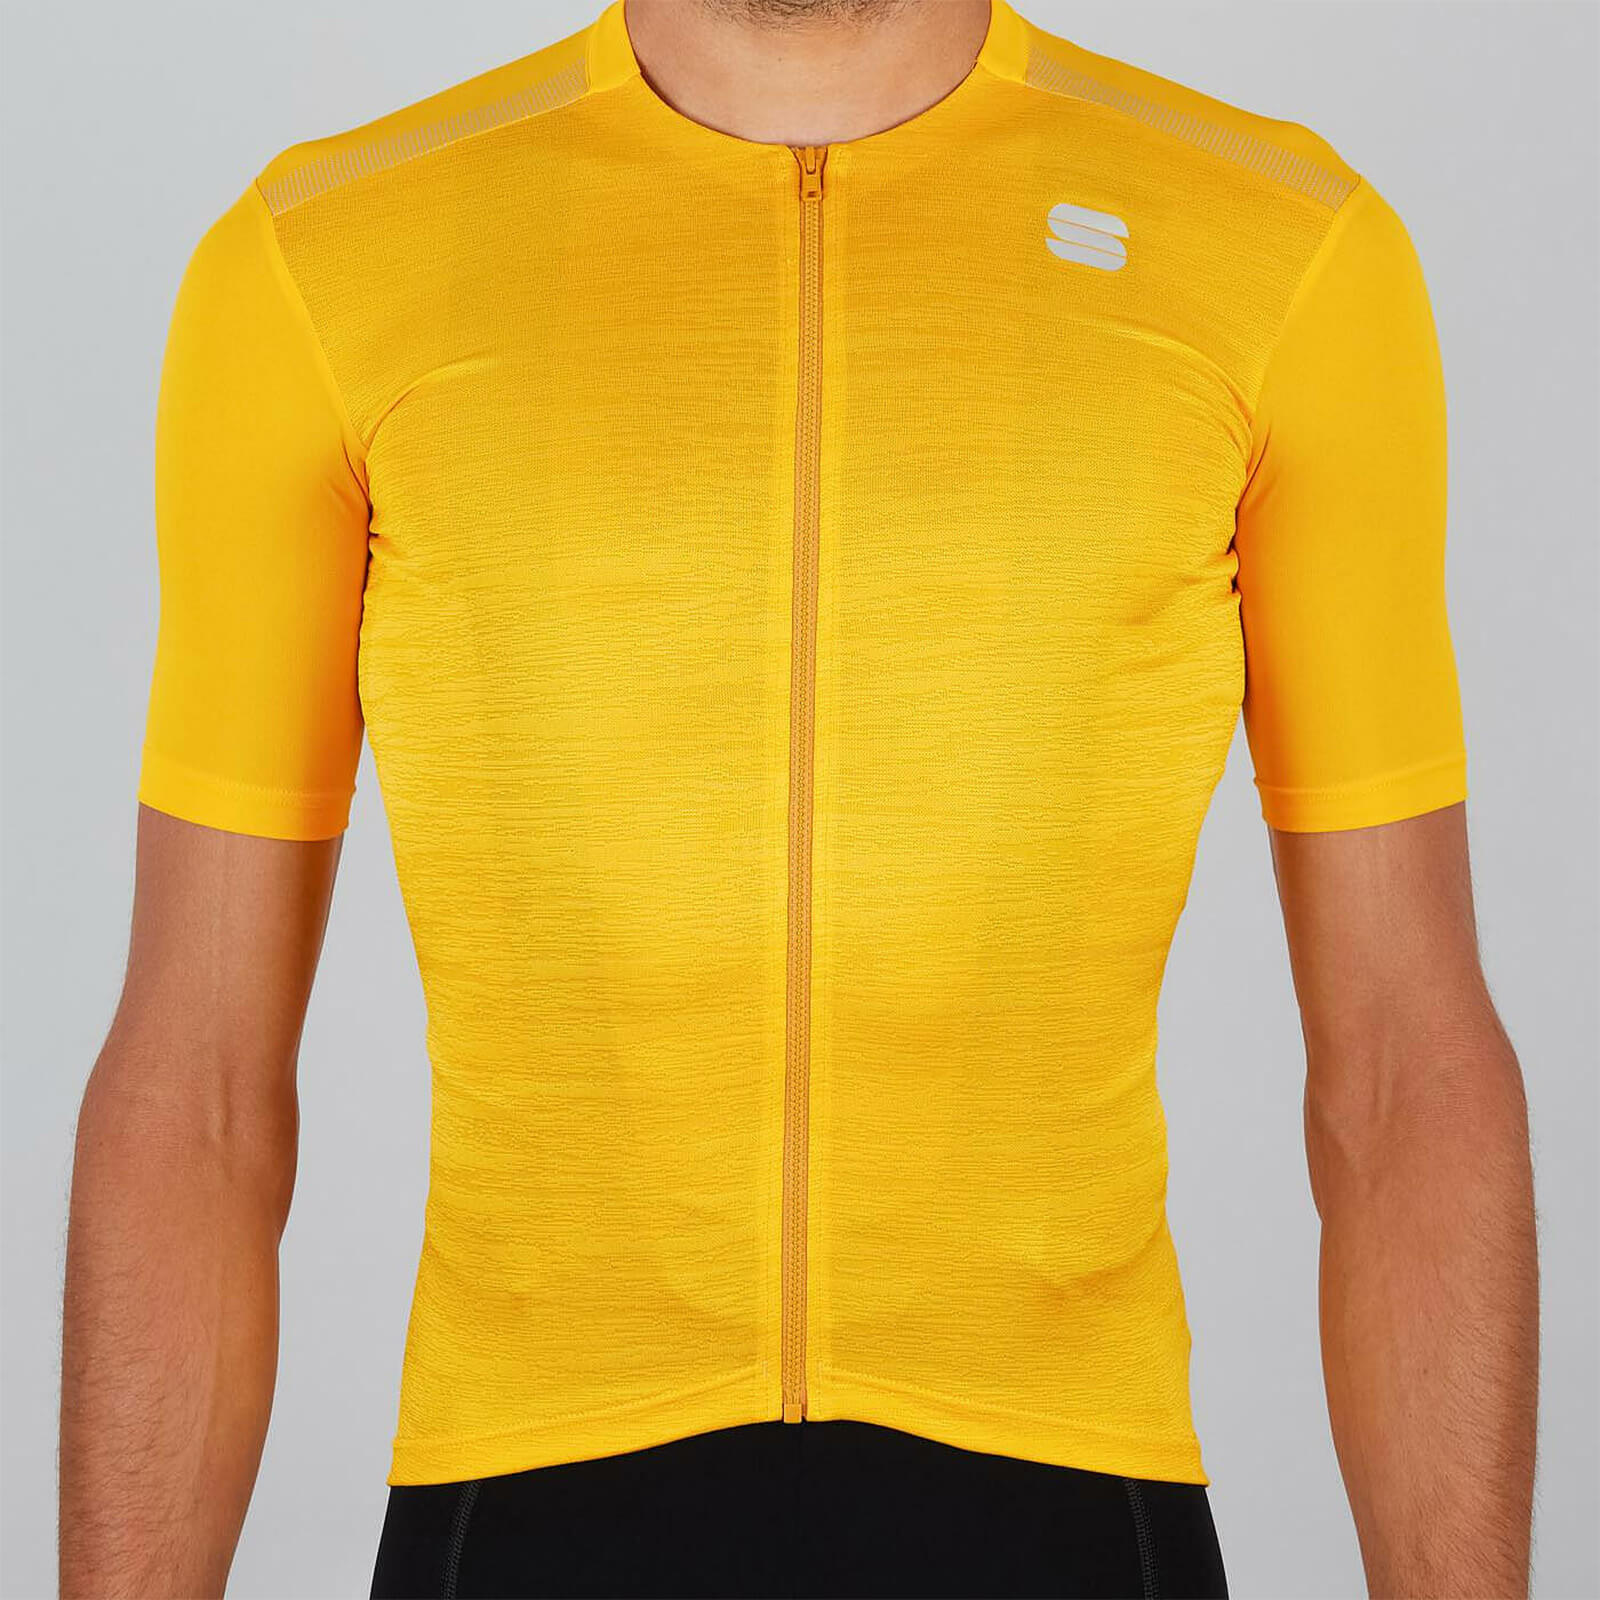 Sportful Supergiara Jersey - XL - Yellow